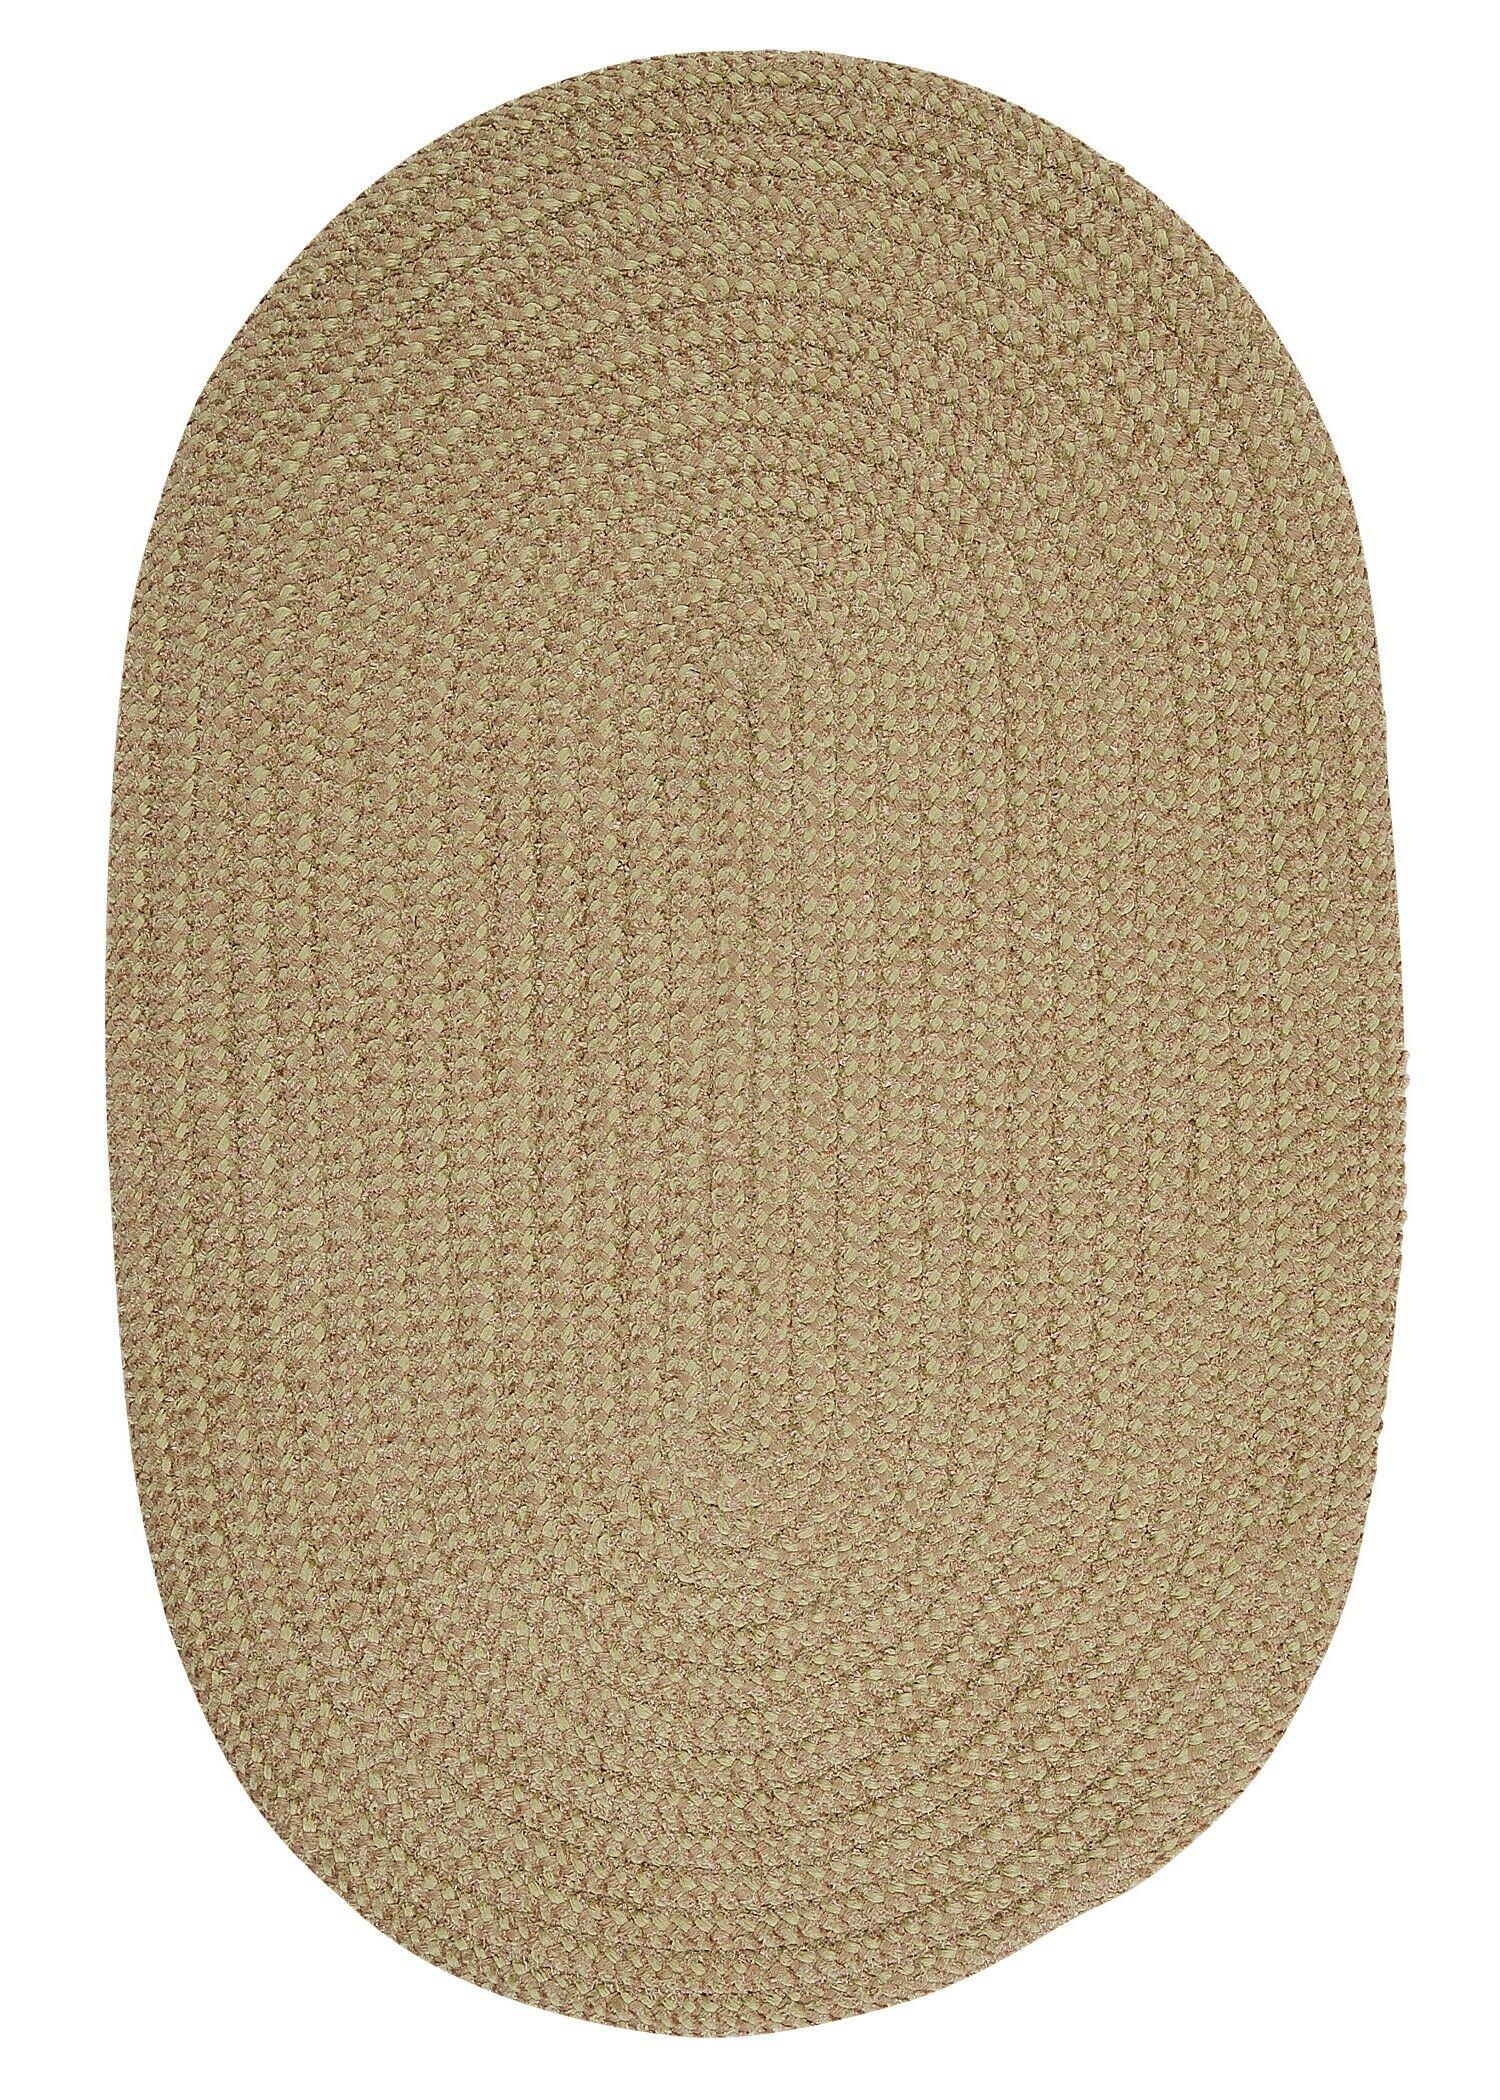 Hale Celery Check Indoor/Outdoor Area Rug Rug Size: Oval Runner 2' x 12'